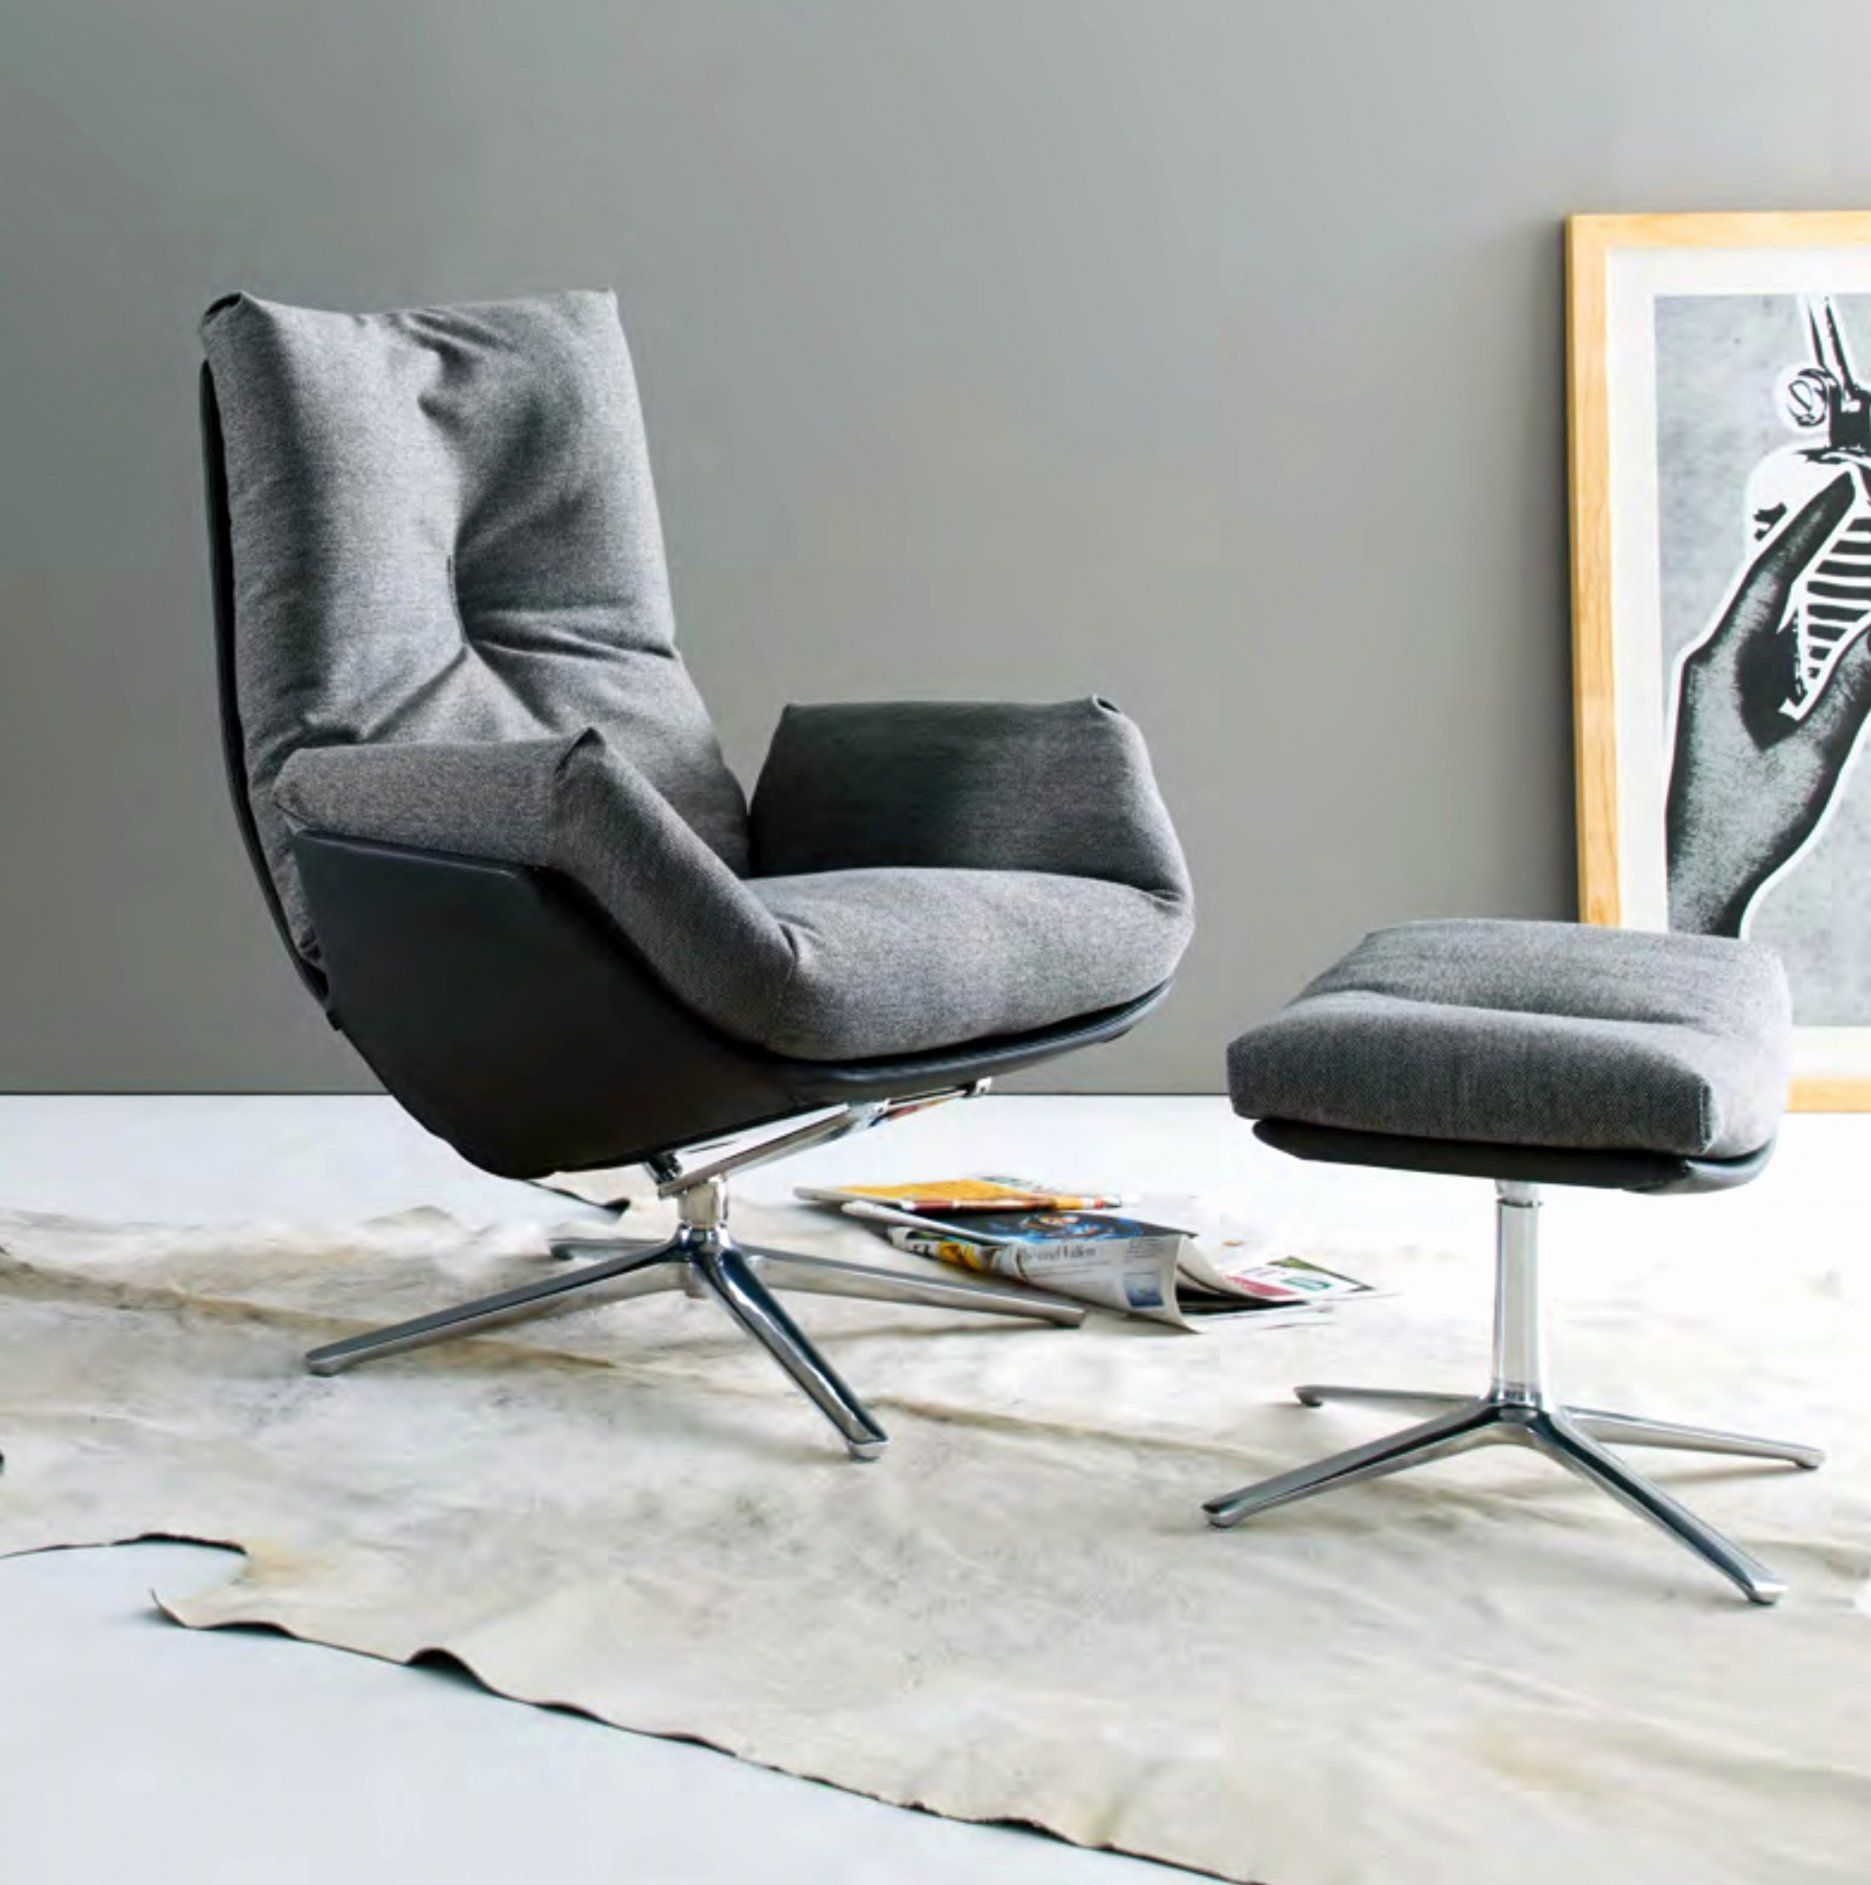 Couch Auf Raten Trotz Schufa Neu Sofa Auf Raten Gallery Bigsofa Von Sofa Auf Raten Trotz Schufa Bi Contemporary Armchair Eames Lounge Chair Contemporary Chairs